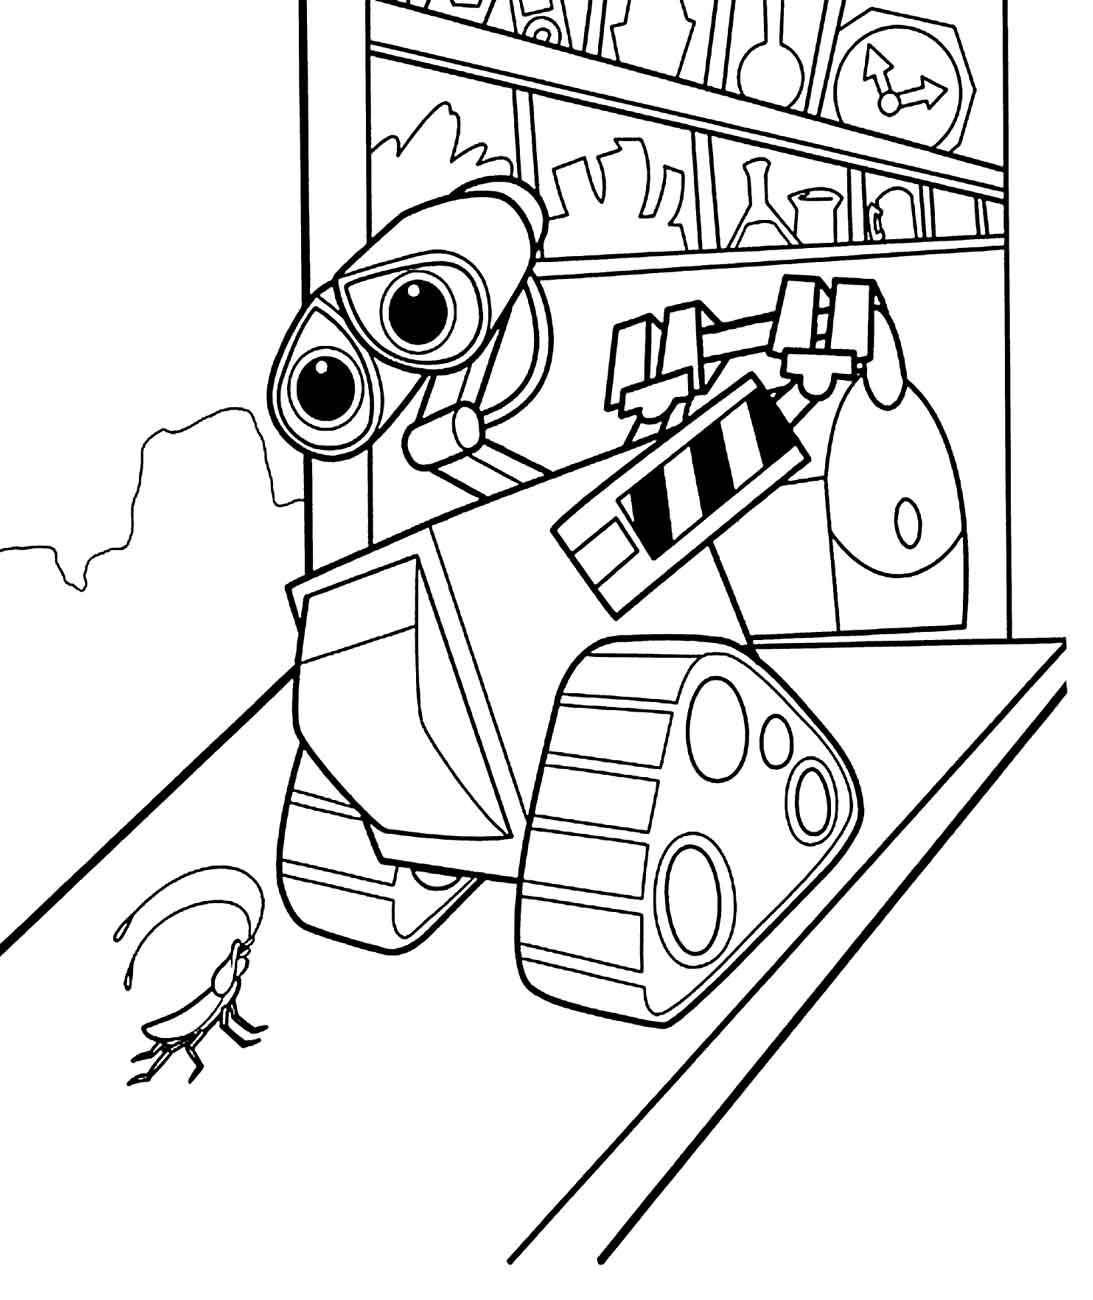 Kolorowanki Roboty 11 Fd